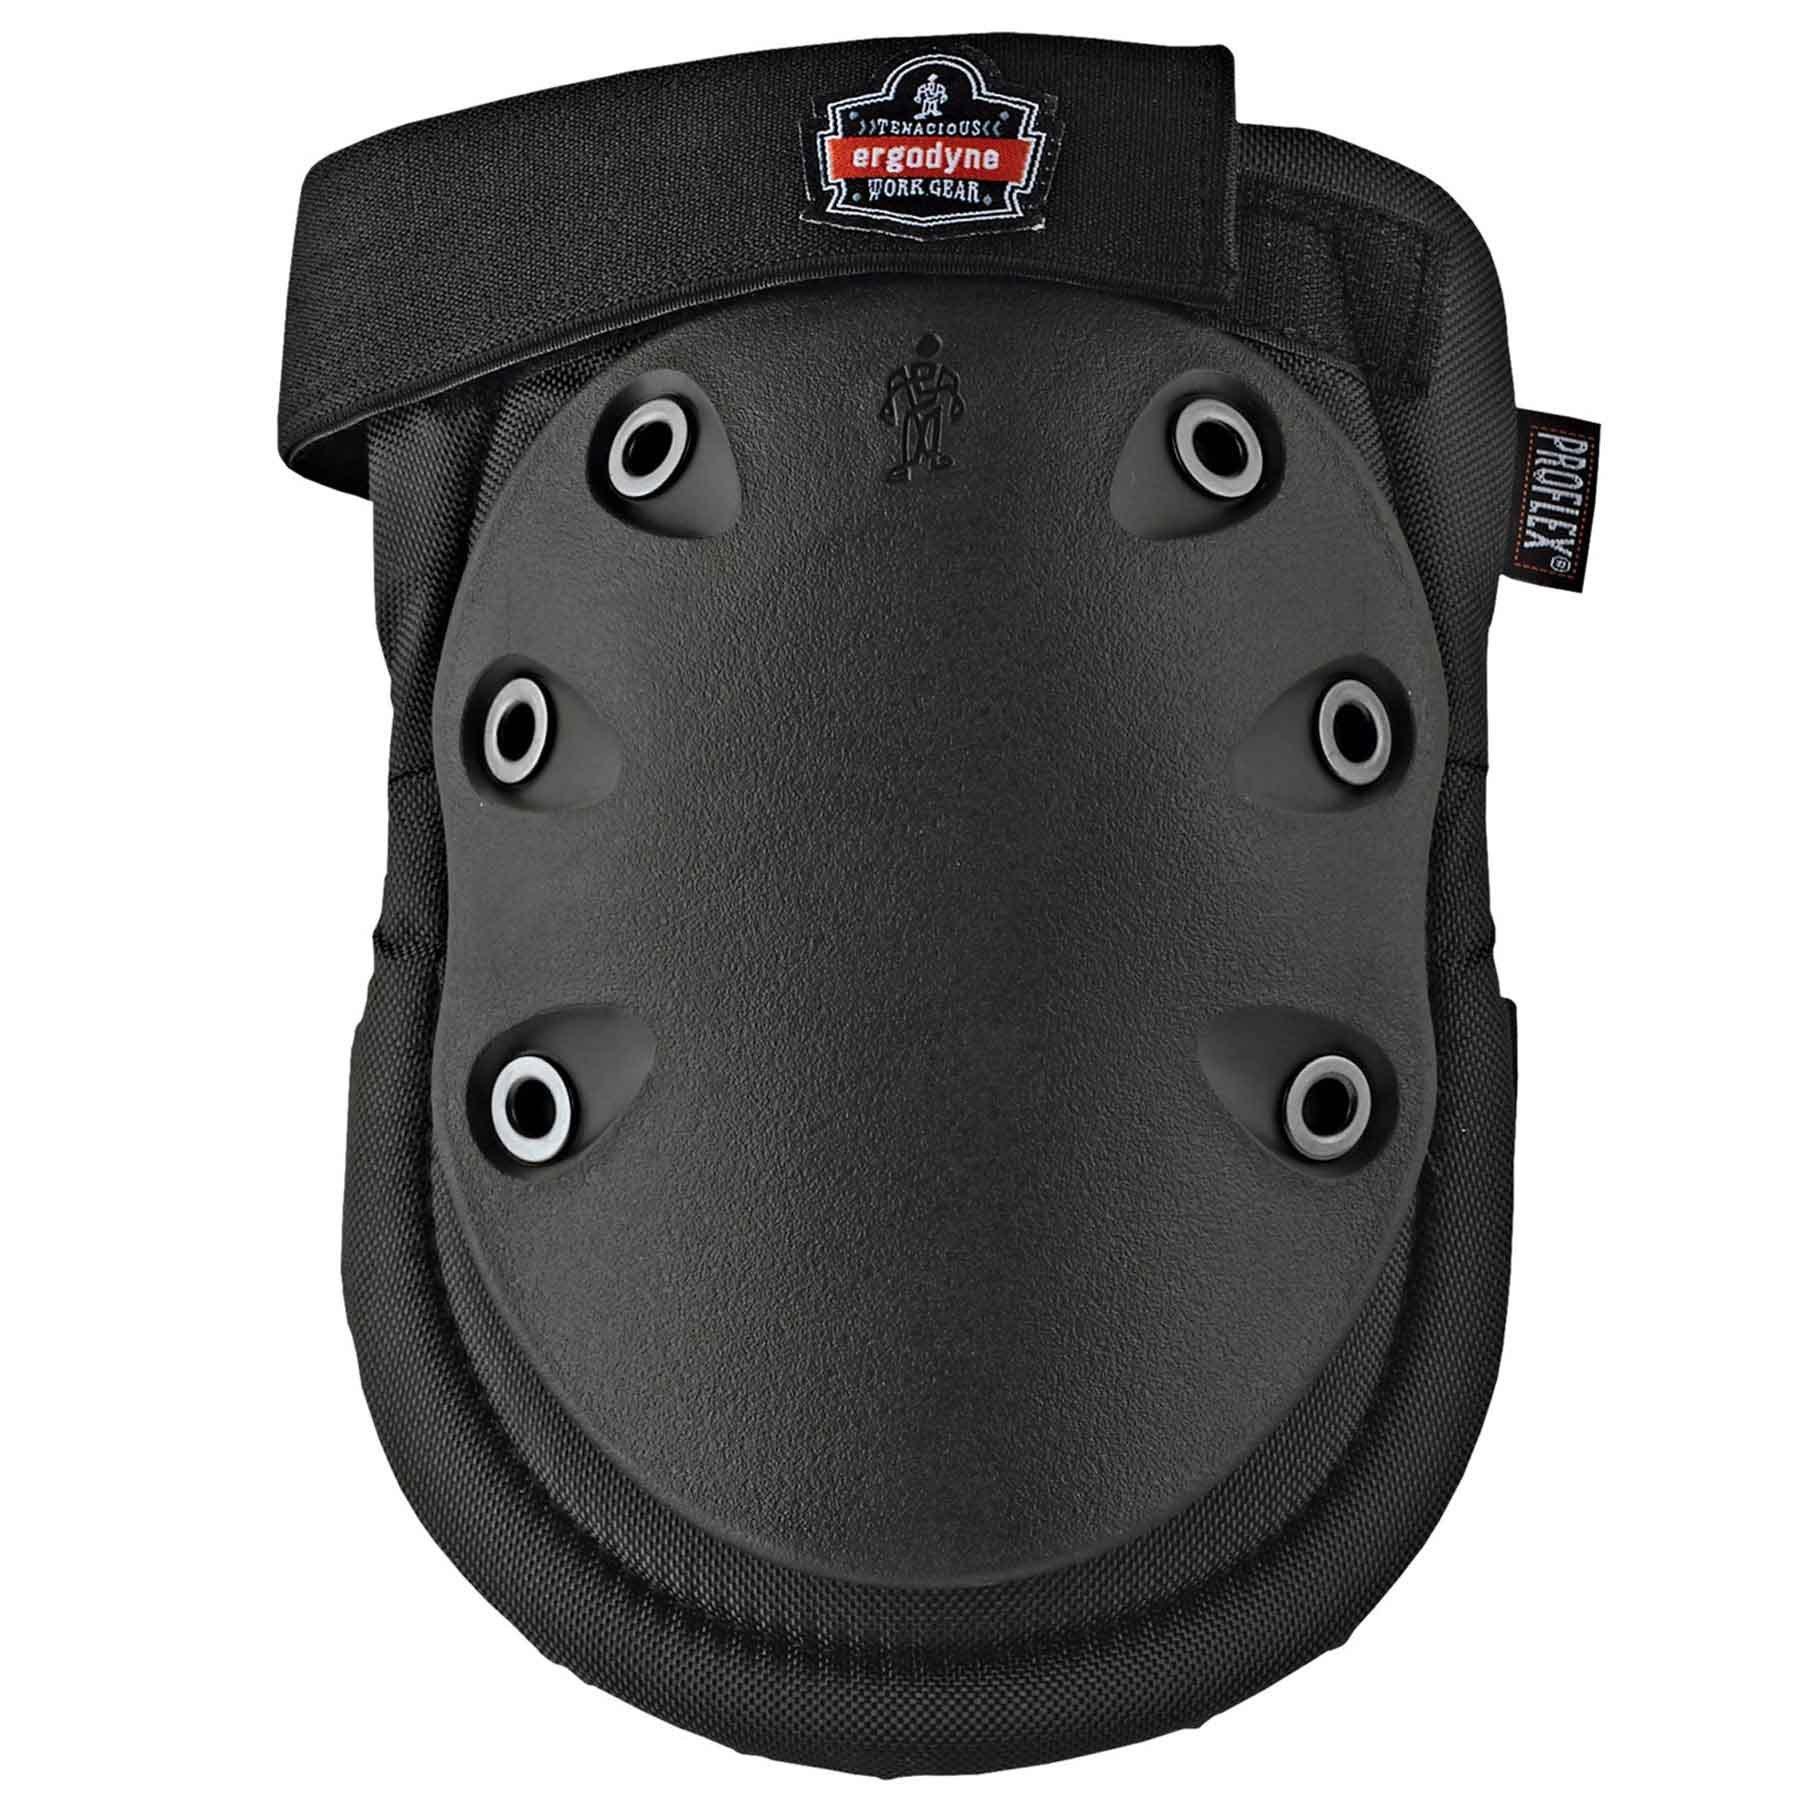 Ergodyne 18336 Ergodyne 18336 Proflex(R) 335Hl Slip Resistant Rubber Cap Knee Pad